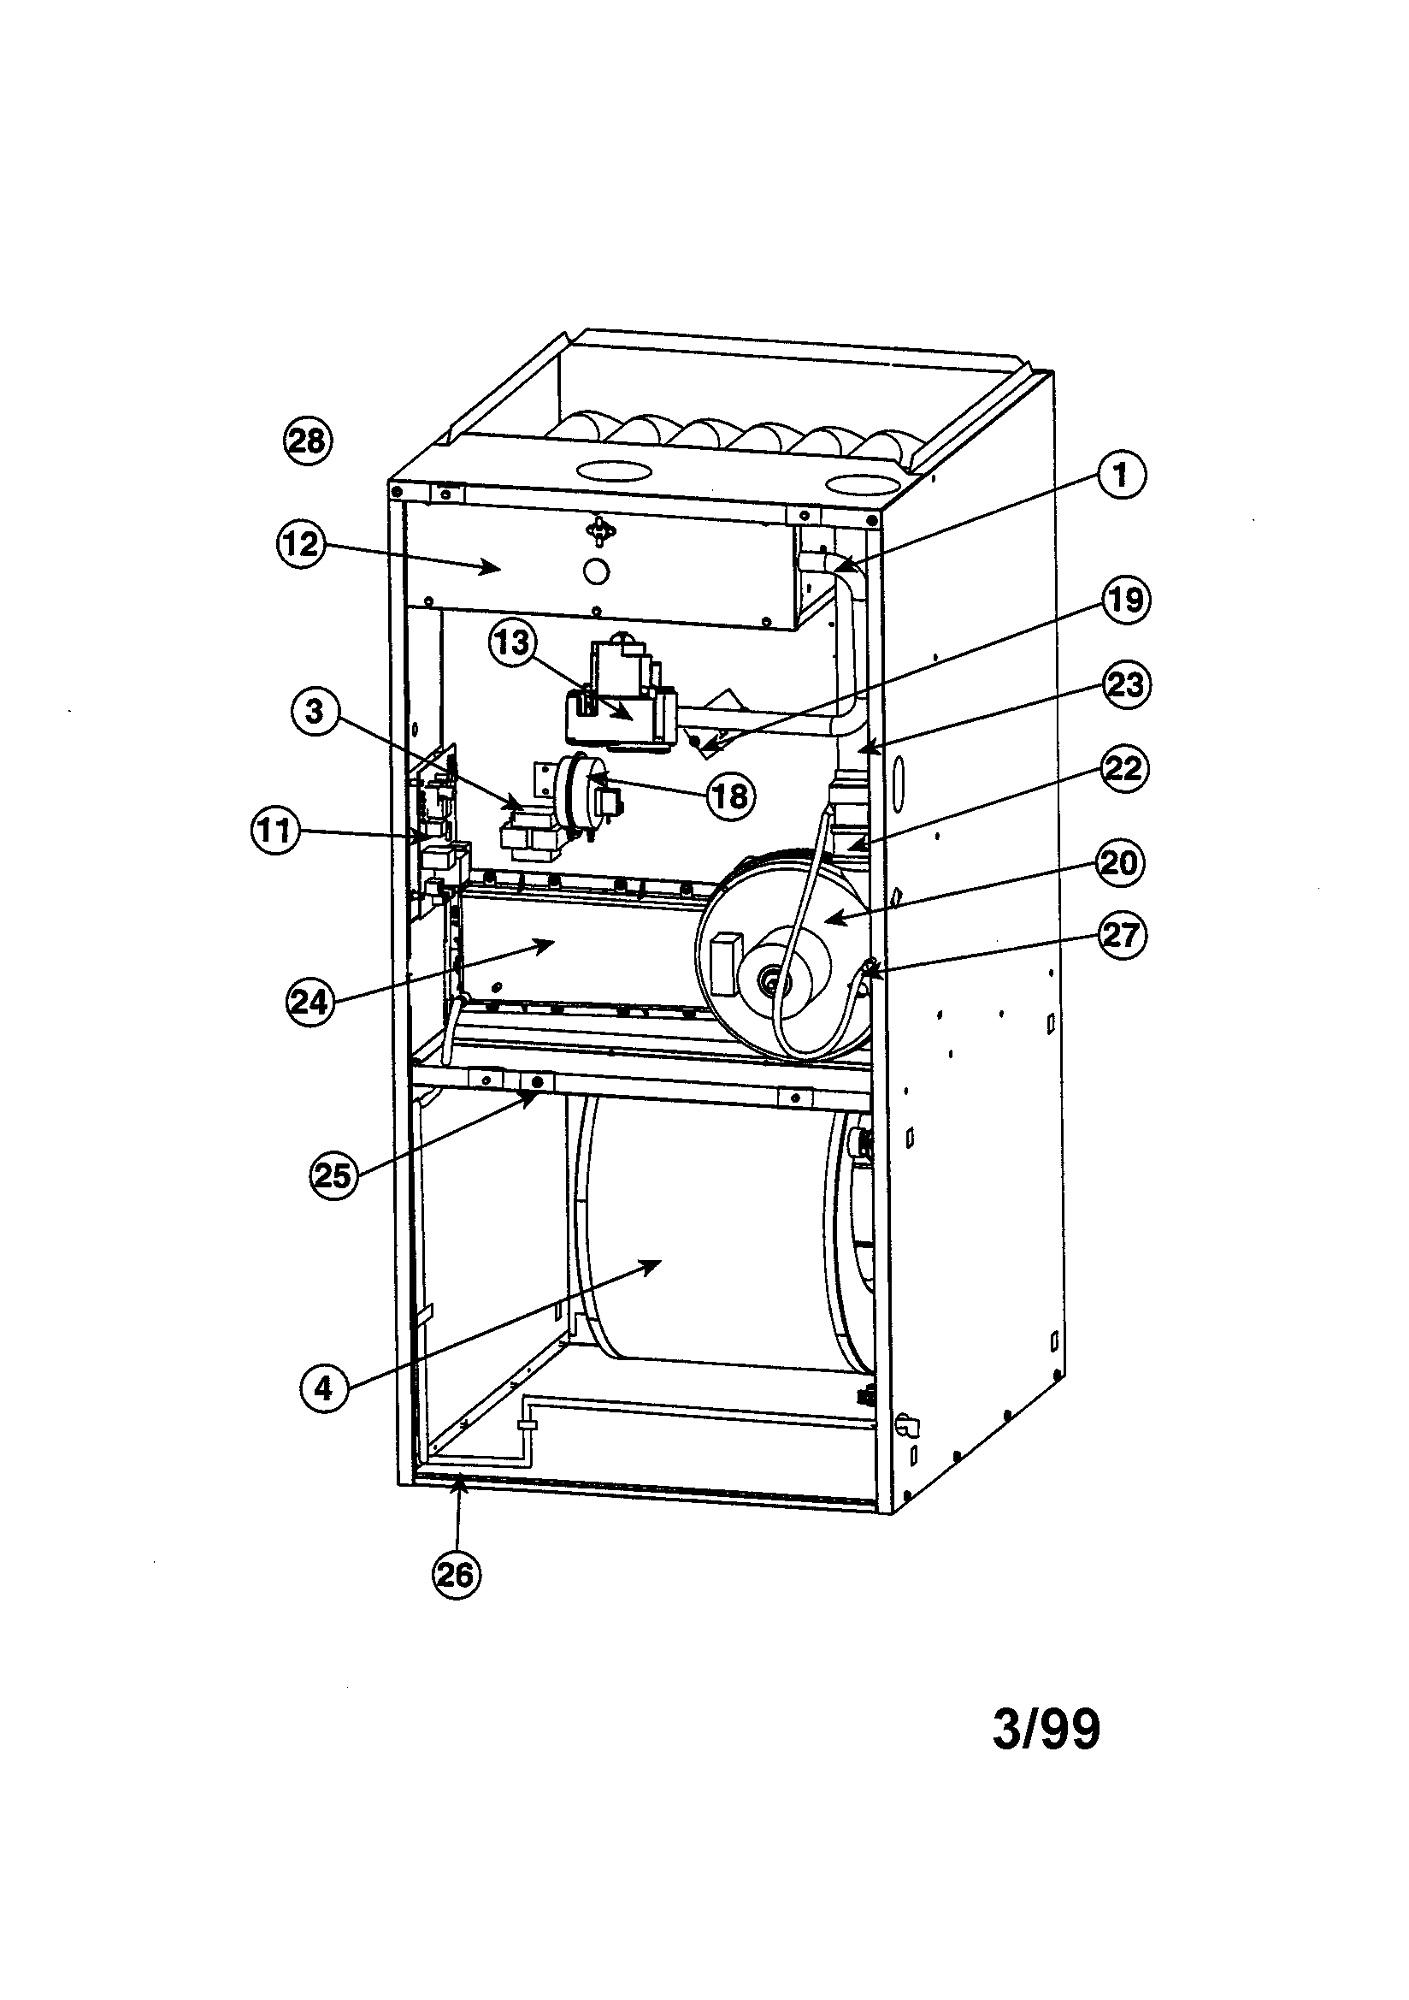 Furnace Diagrams